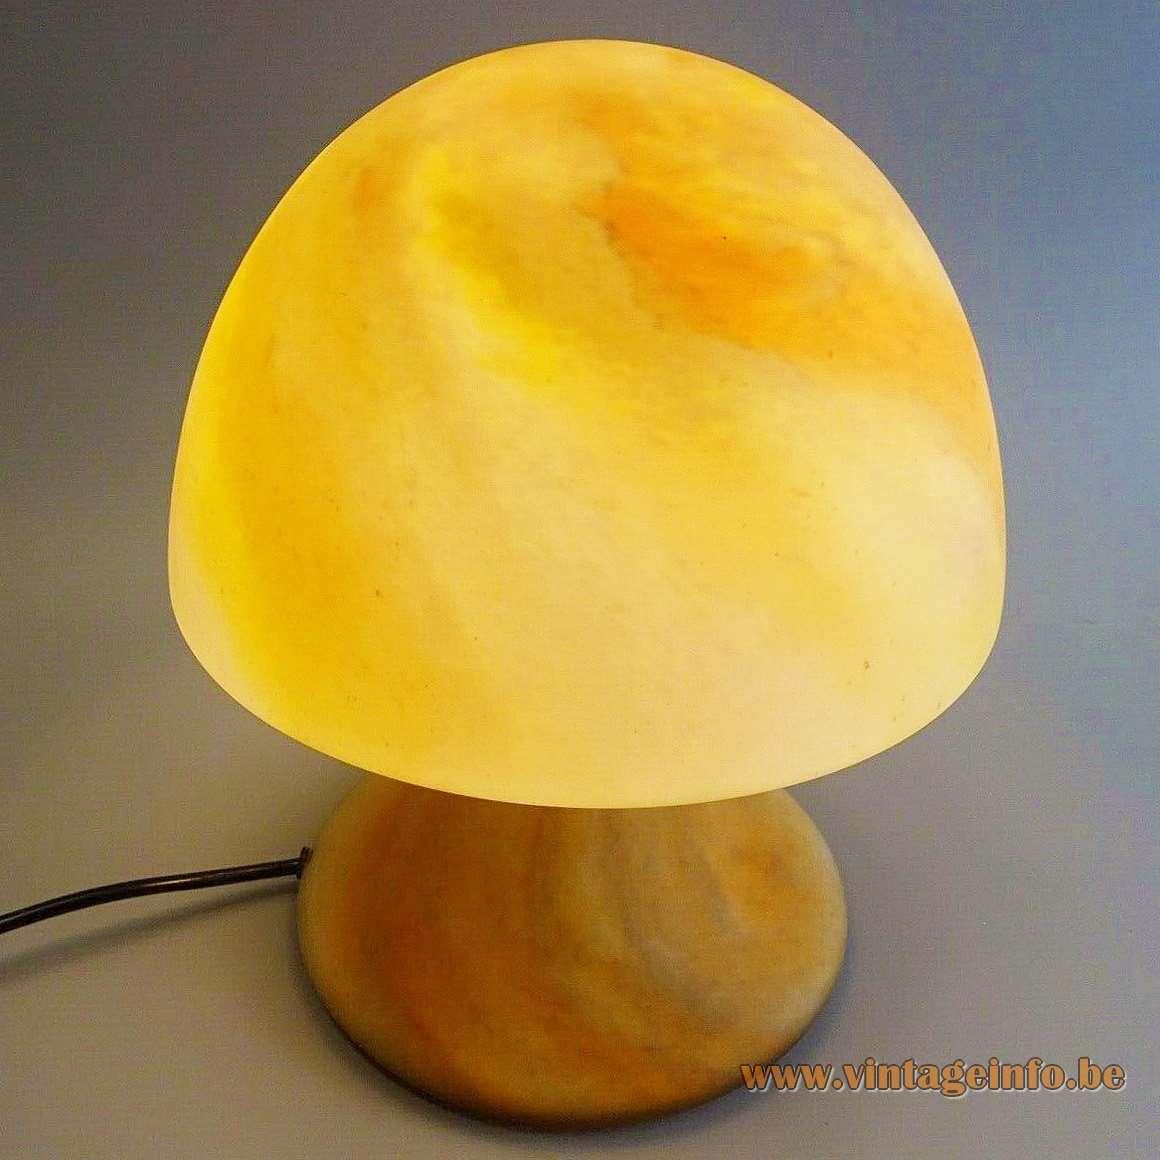 Limburg Glashütte Art Nouveau Style Mushroom Table Lamp 1970s 1980s brown red yellow glass brass